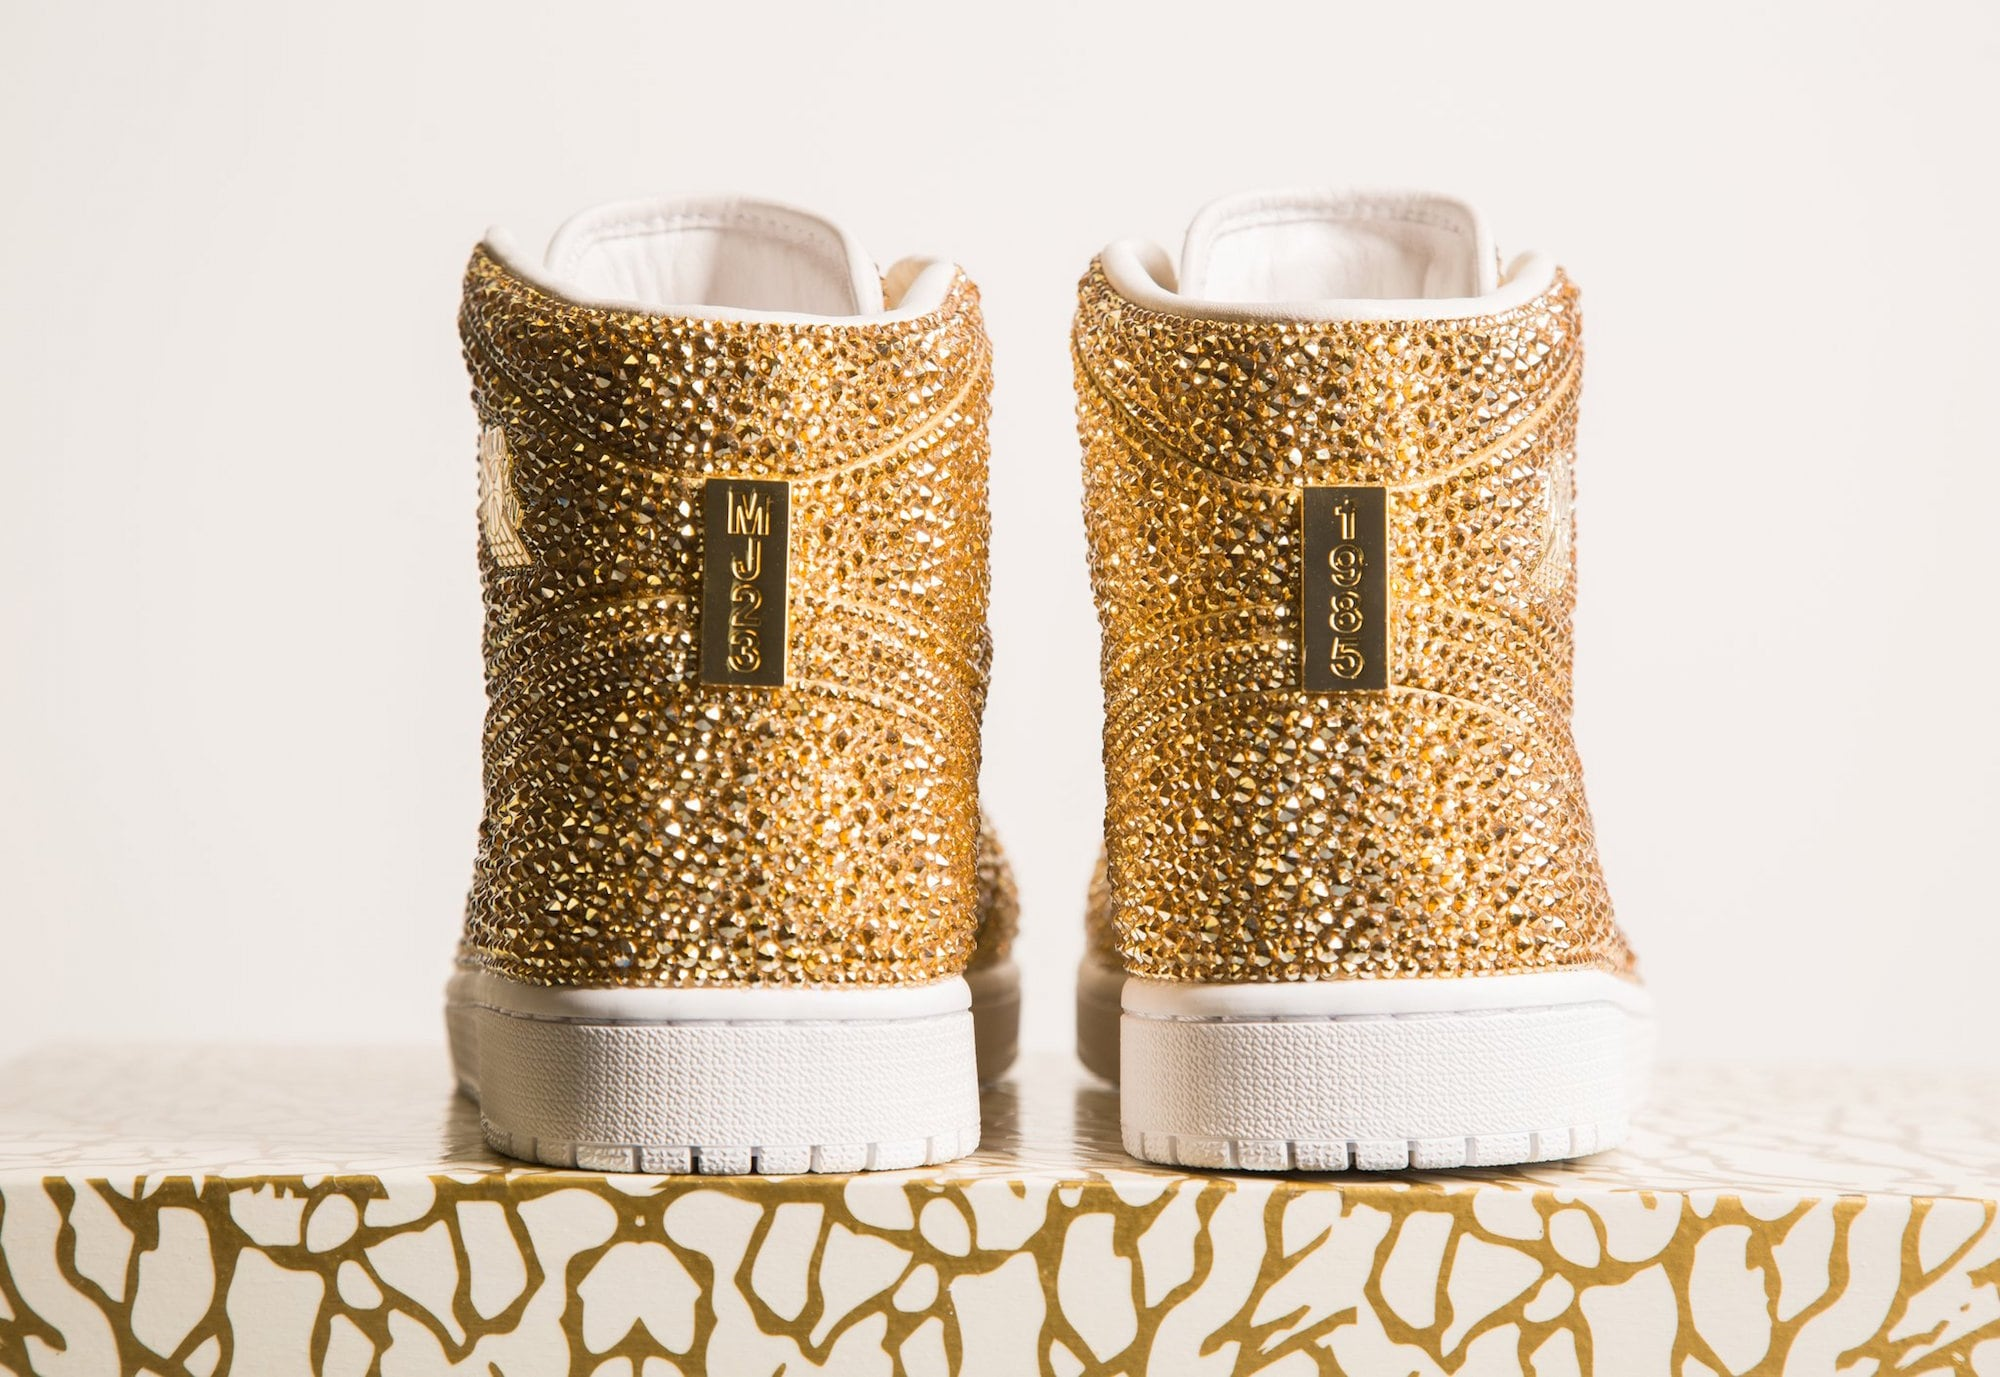 Daniel Jacob verziert Nike Air Jordans mit Swarovski Kristallen 2